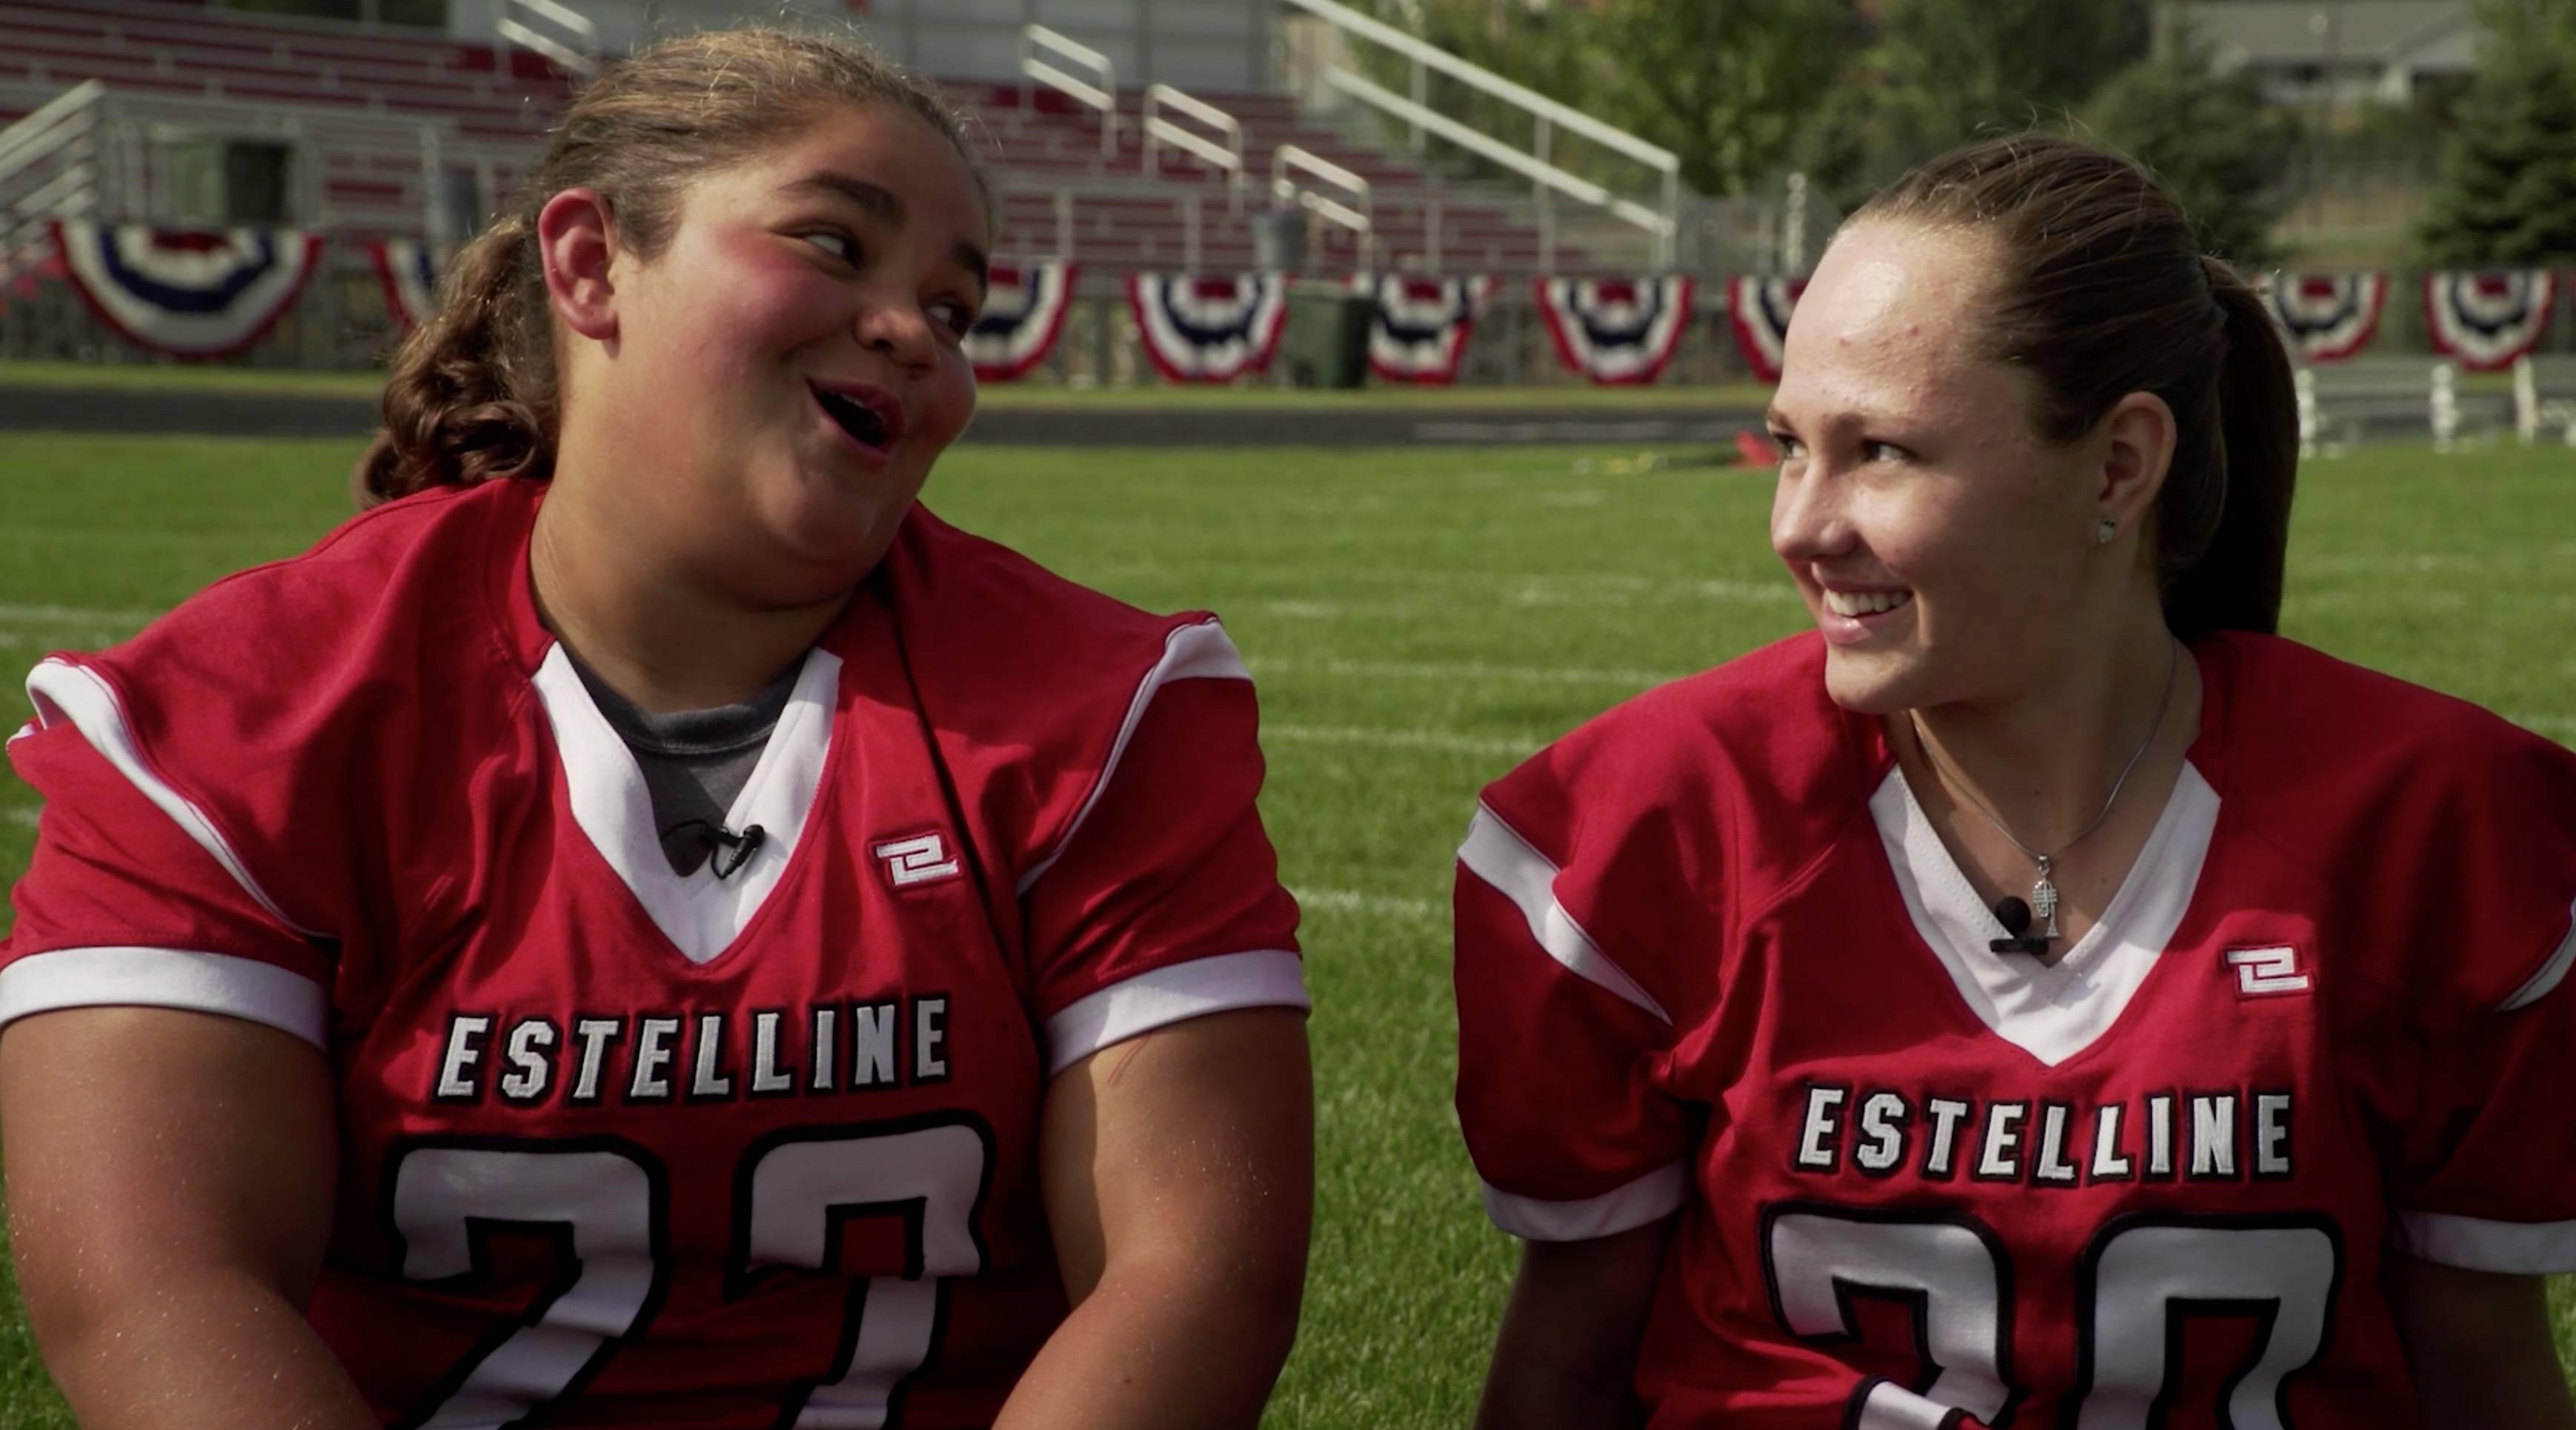 Estelline's Christine and Kaytlyn